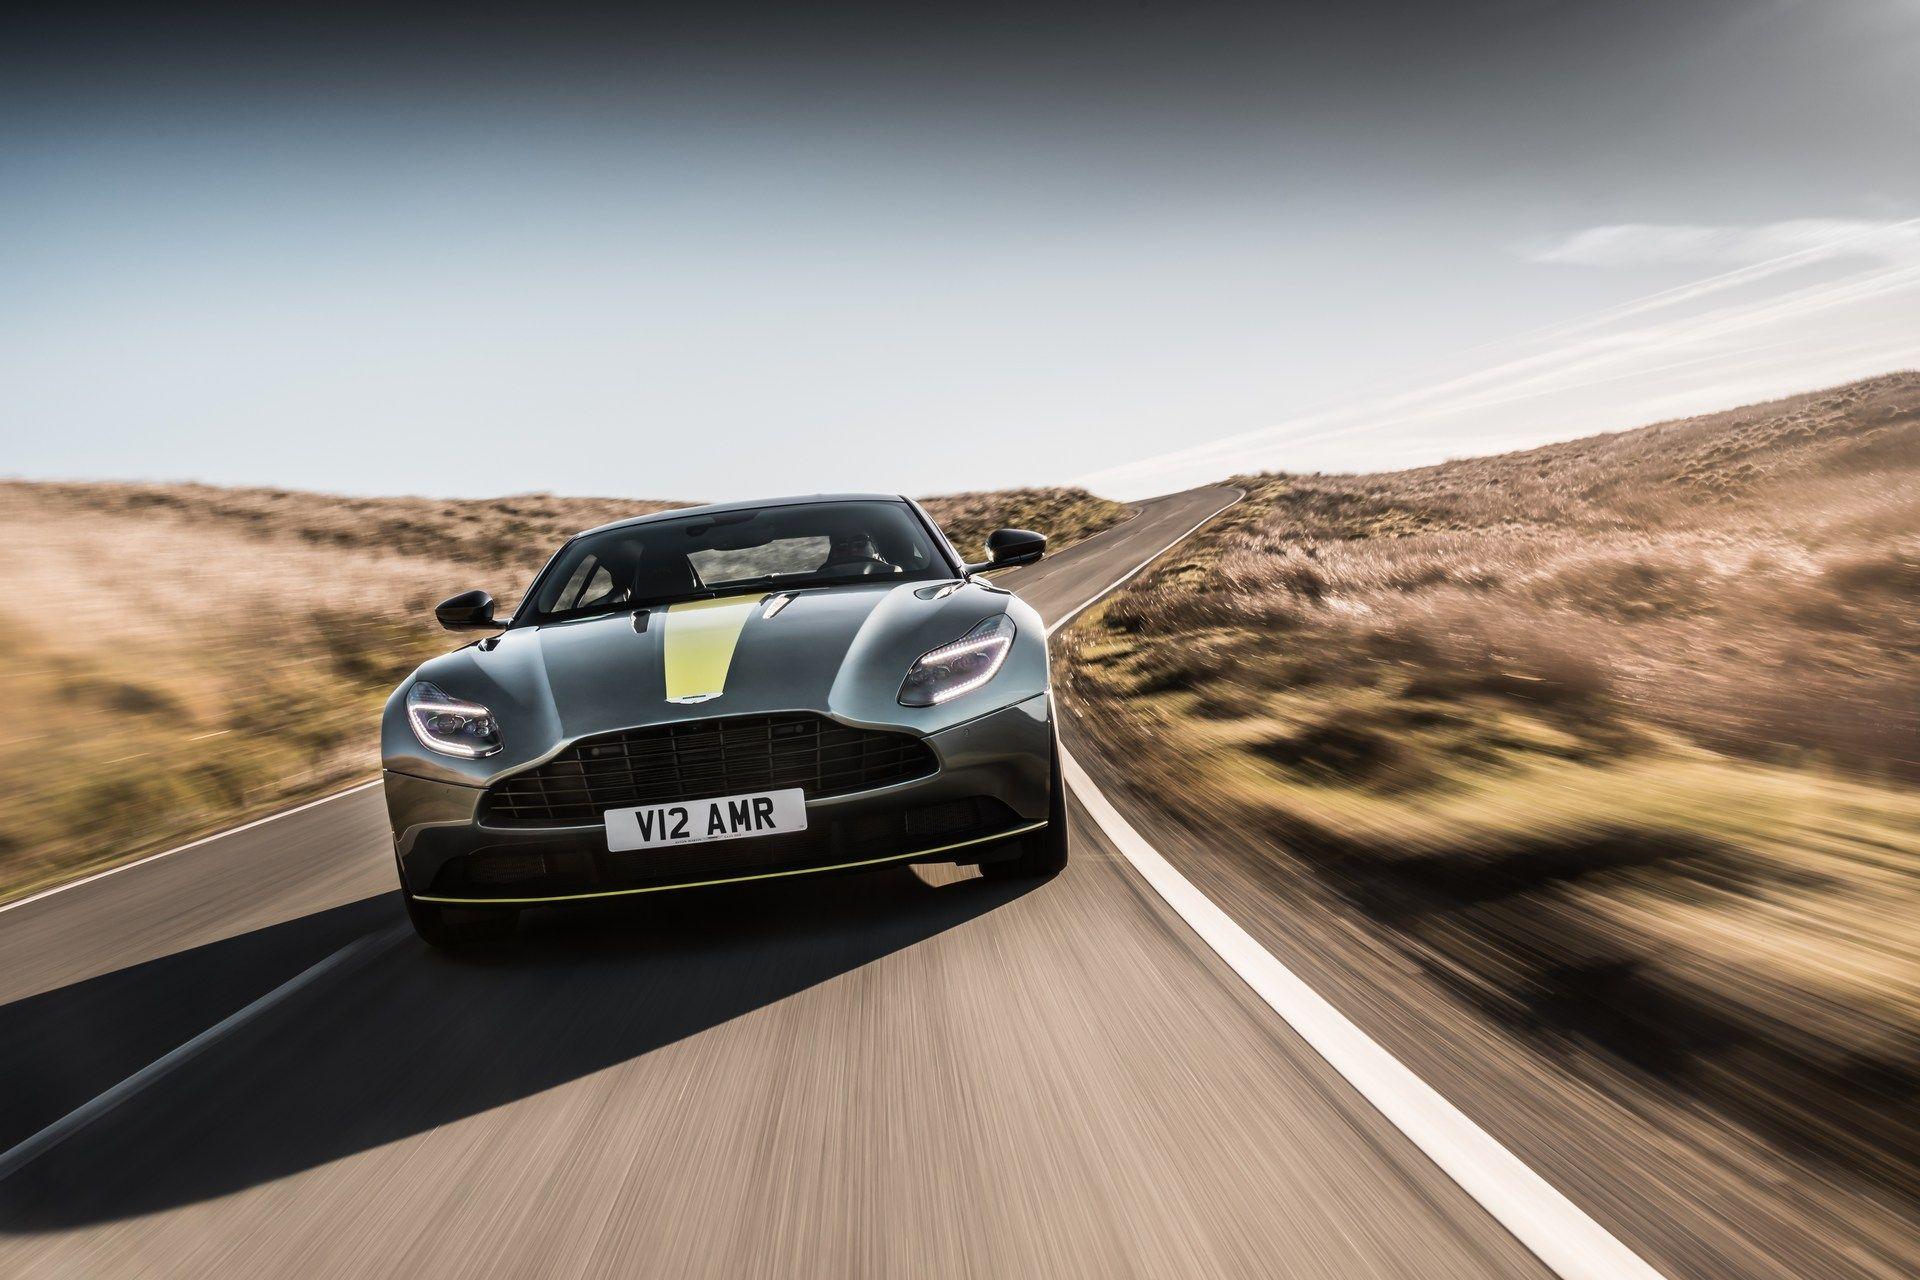 Aston-Martin-DB11-AMR-1